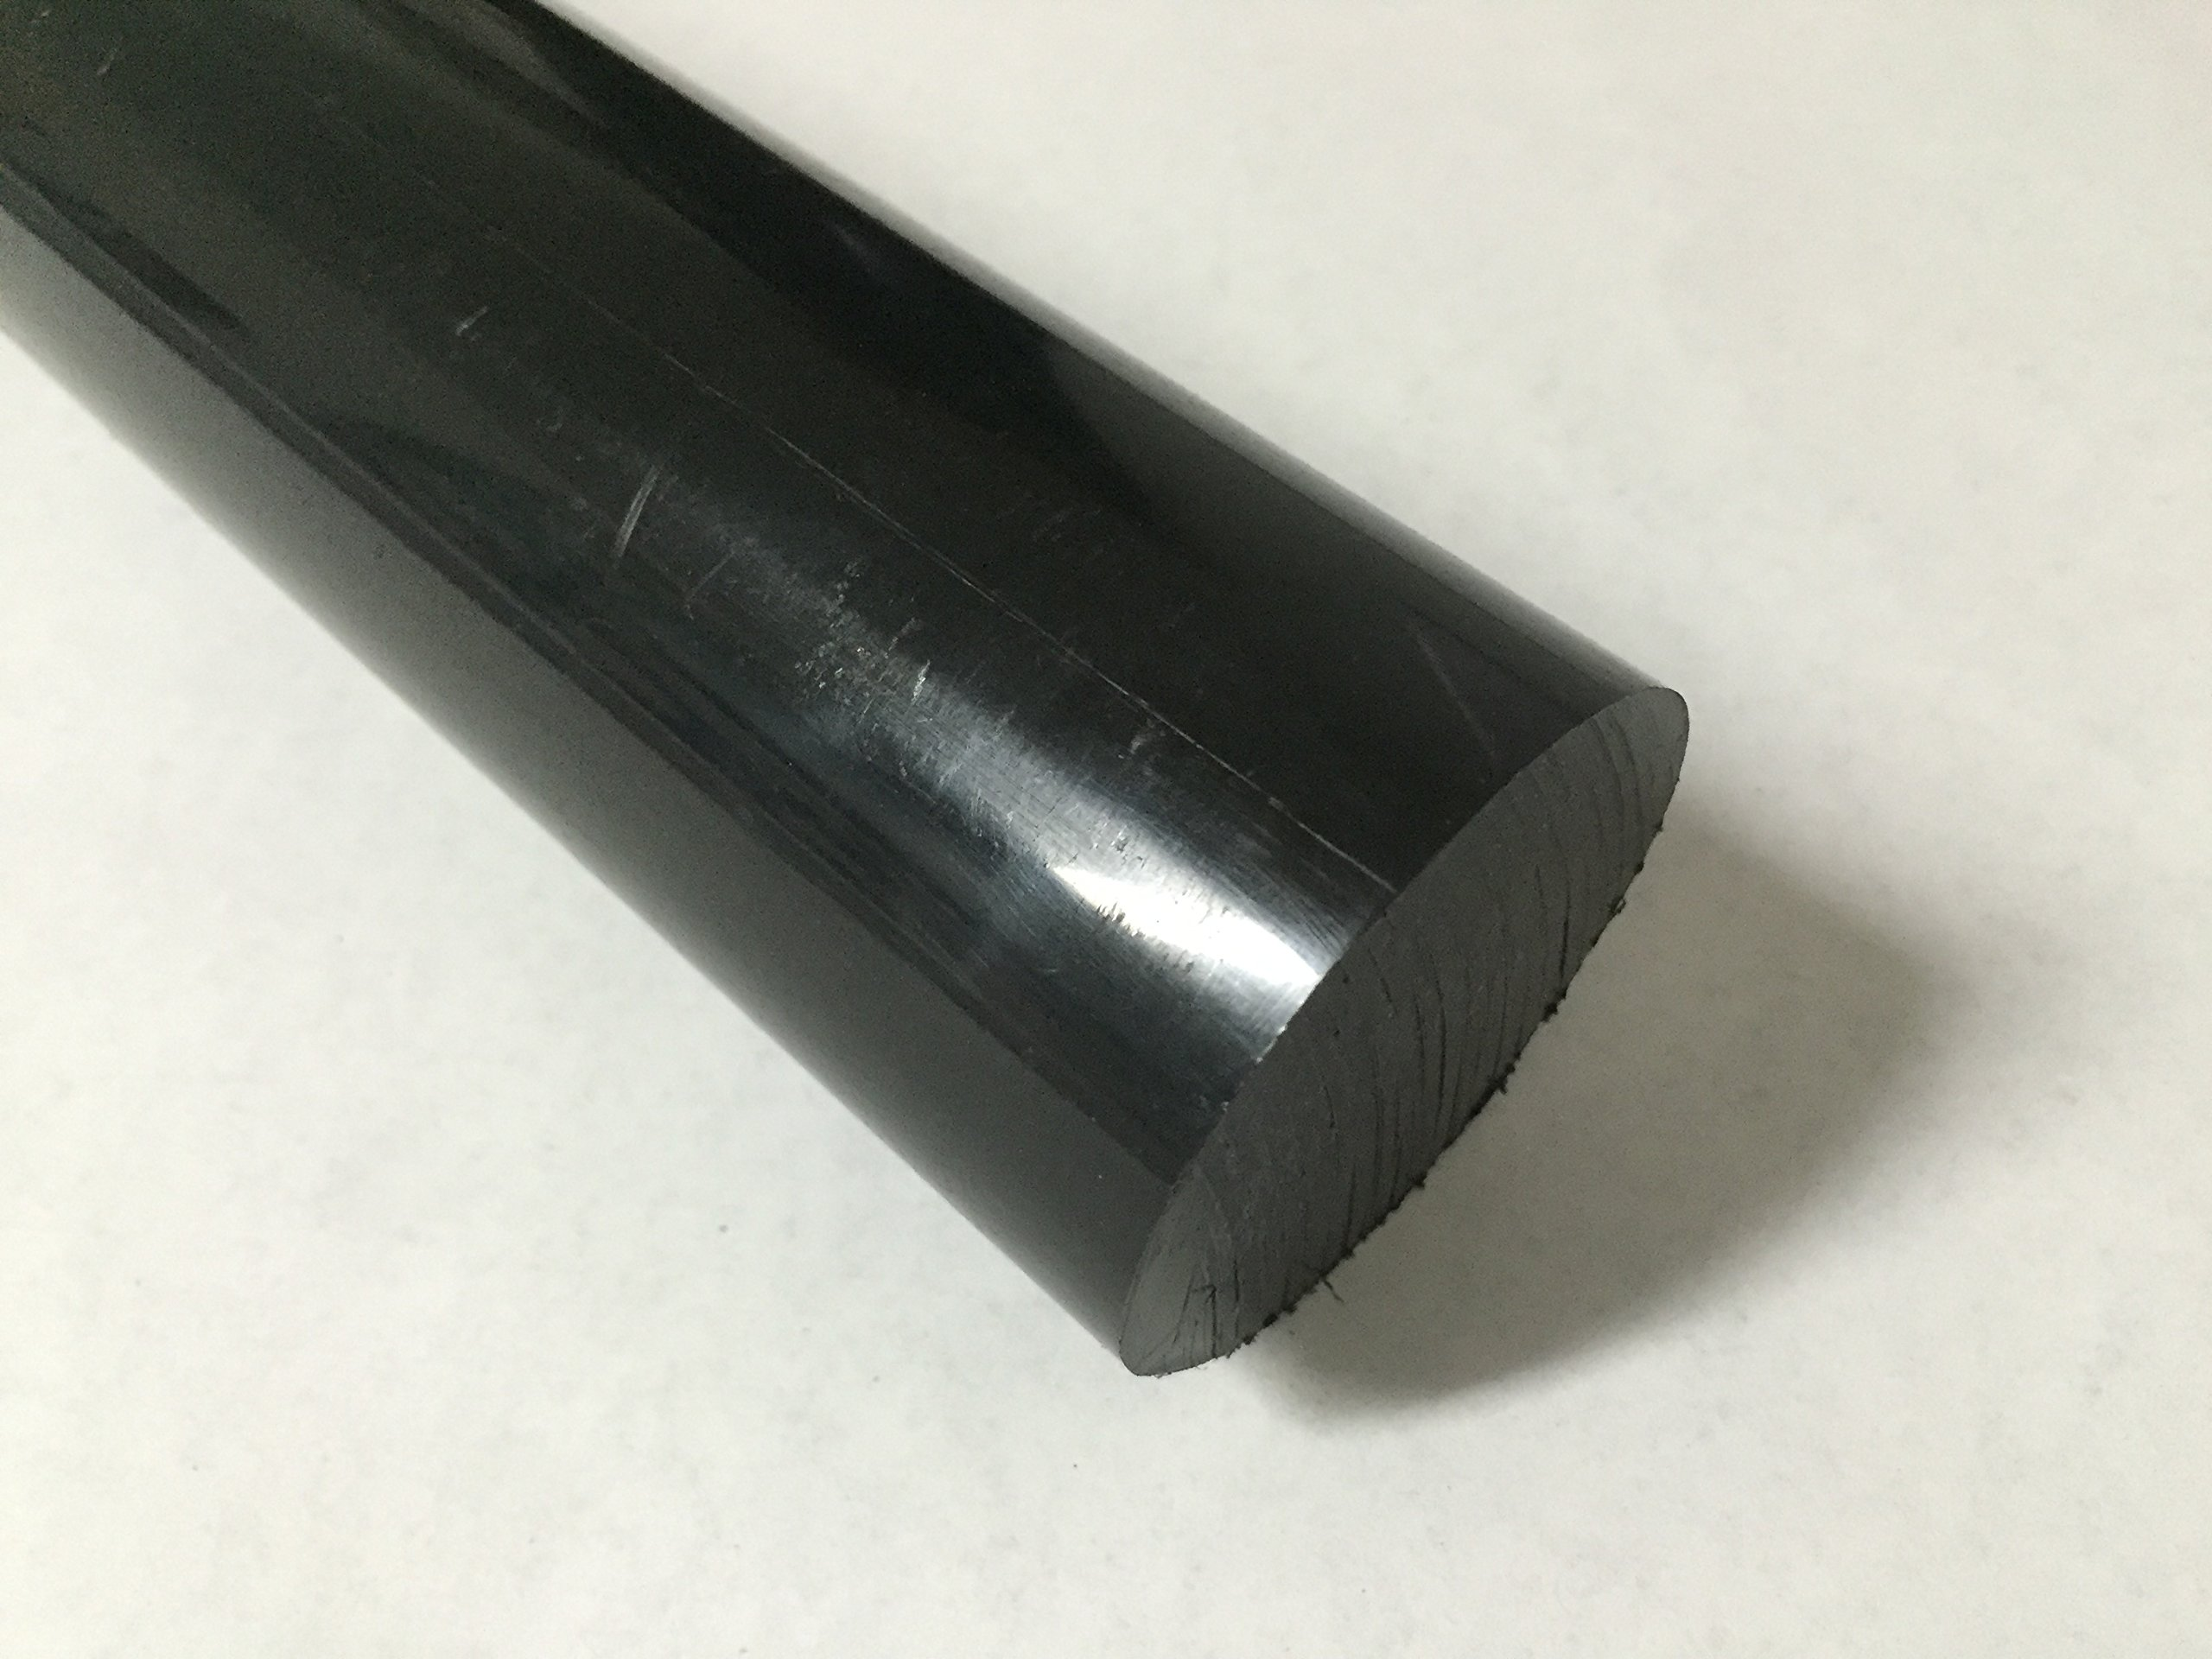 Acetal Copolymer Plastic Round Rod 4'' Diameter, 12'' Length - Black Color by Polymersan